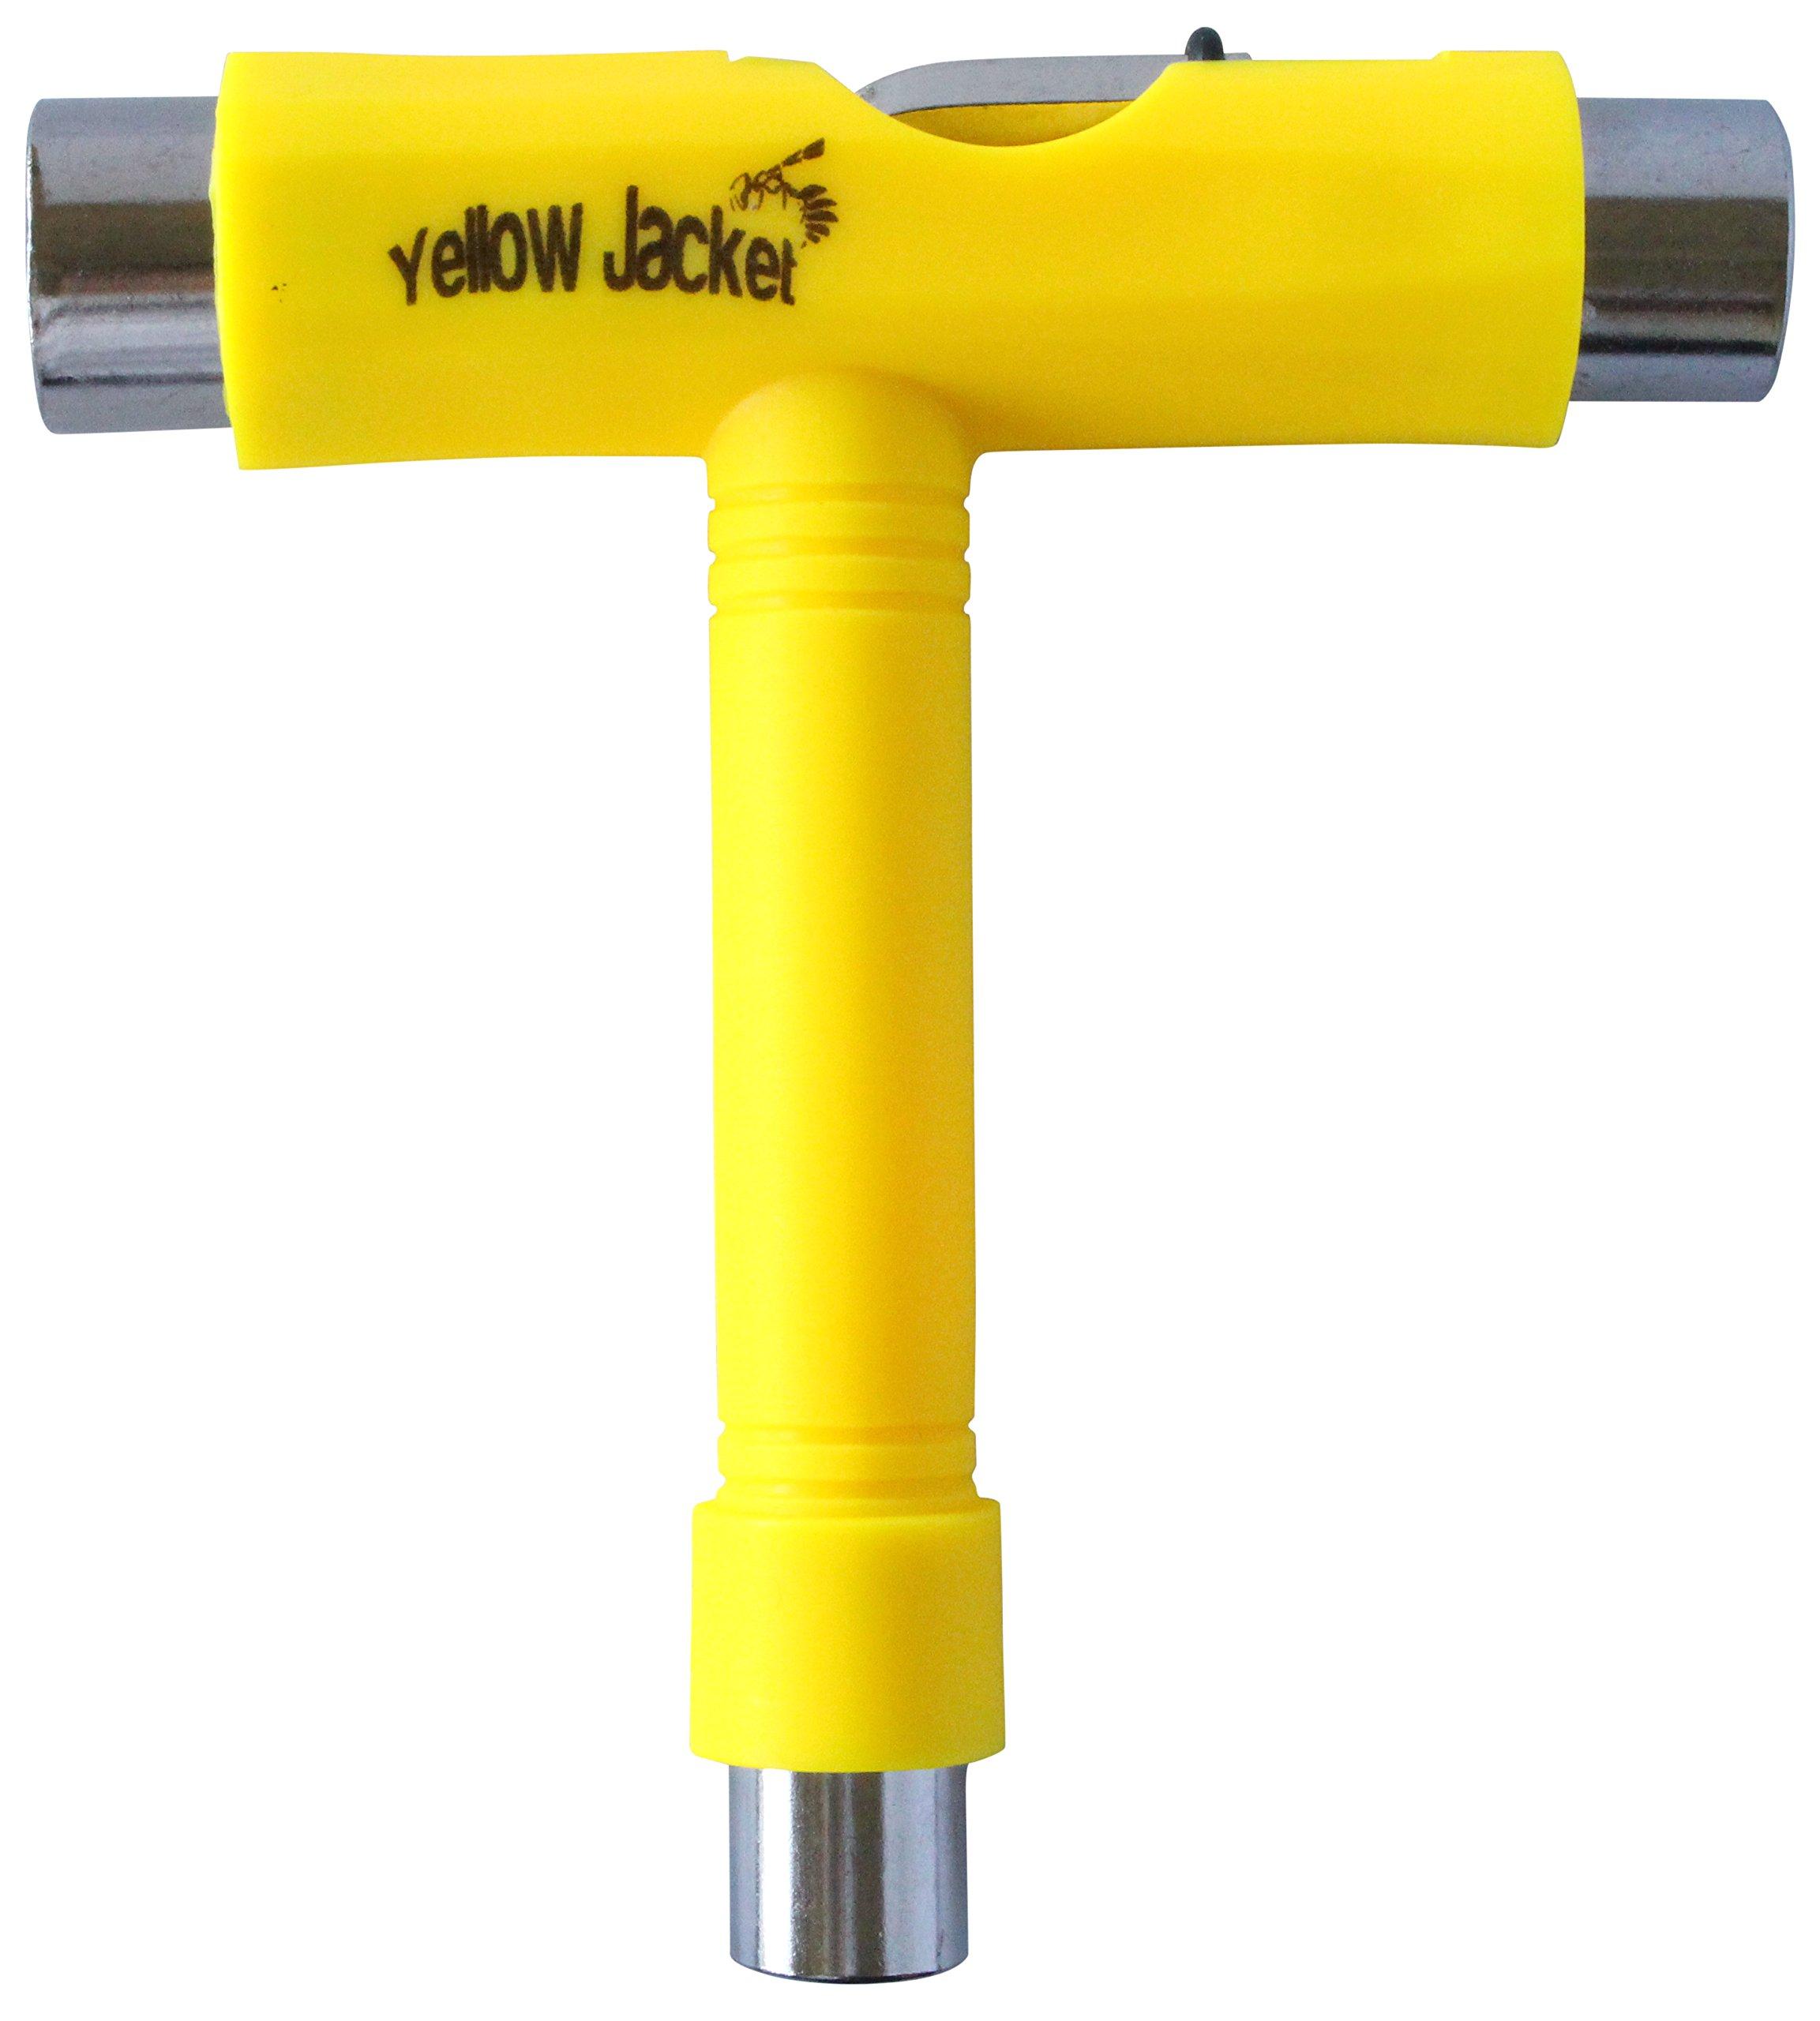 Yellow Jacket Skateboard Tool, Snowboard